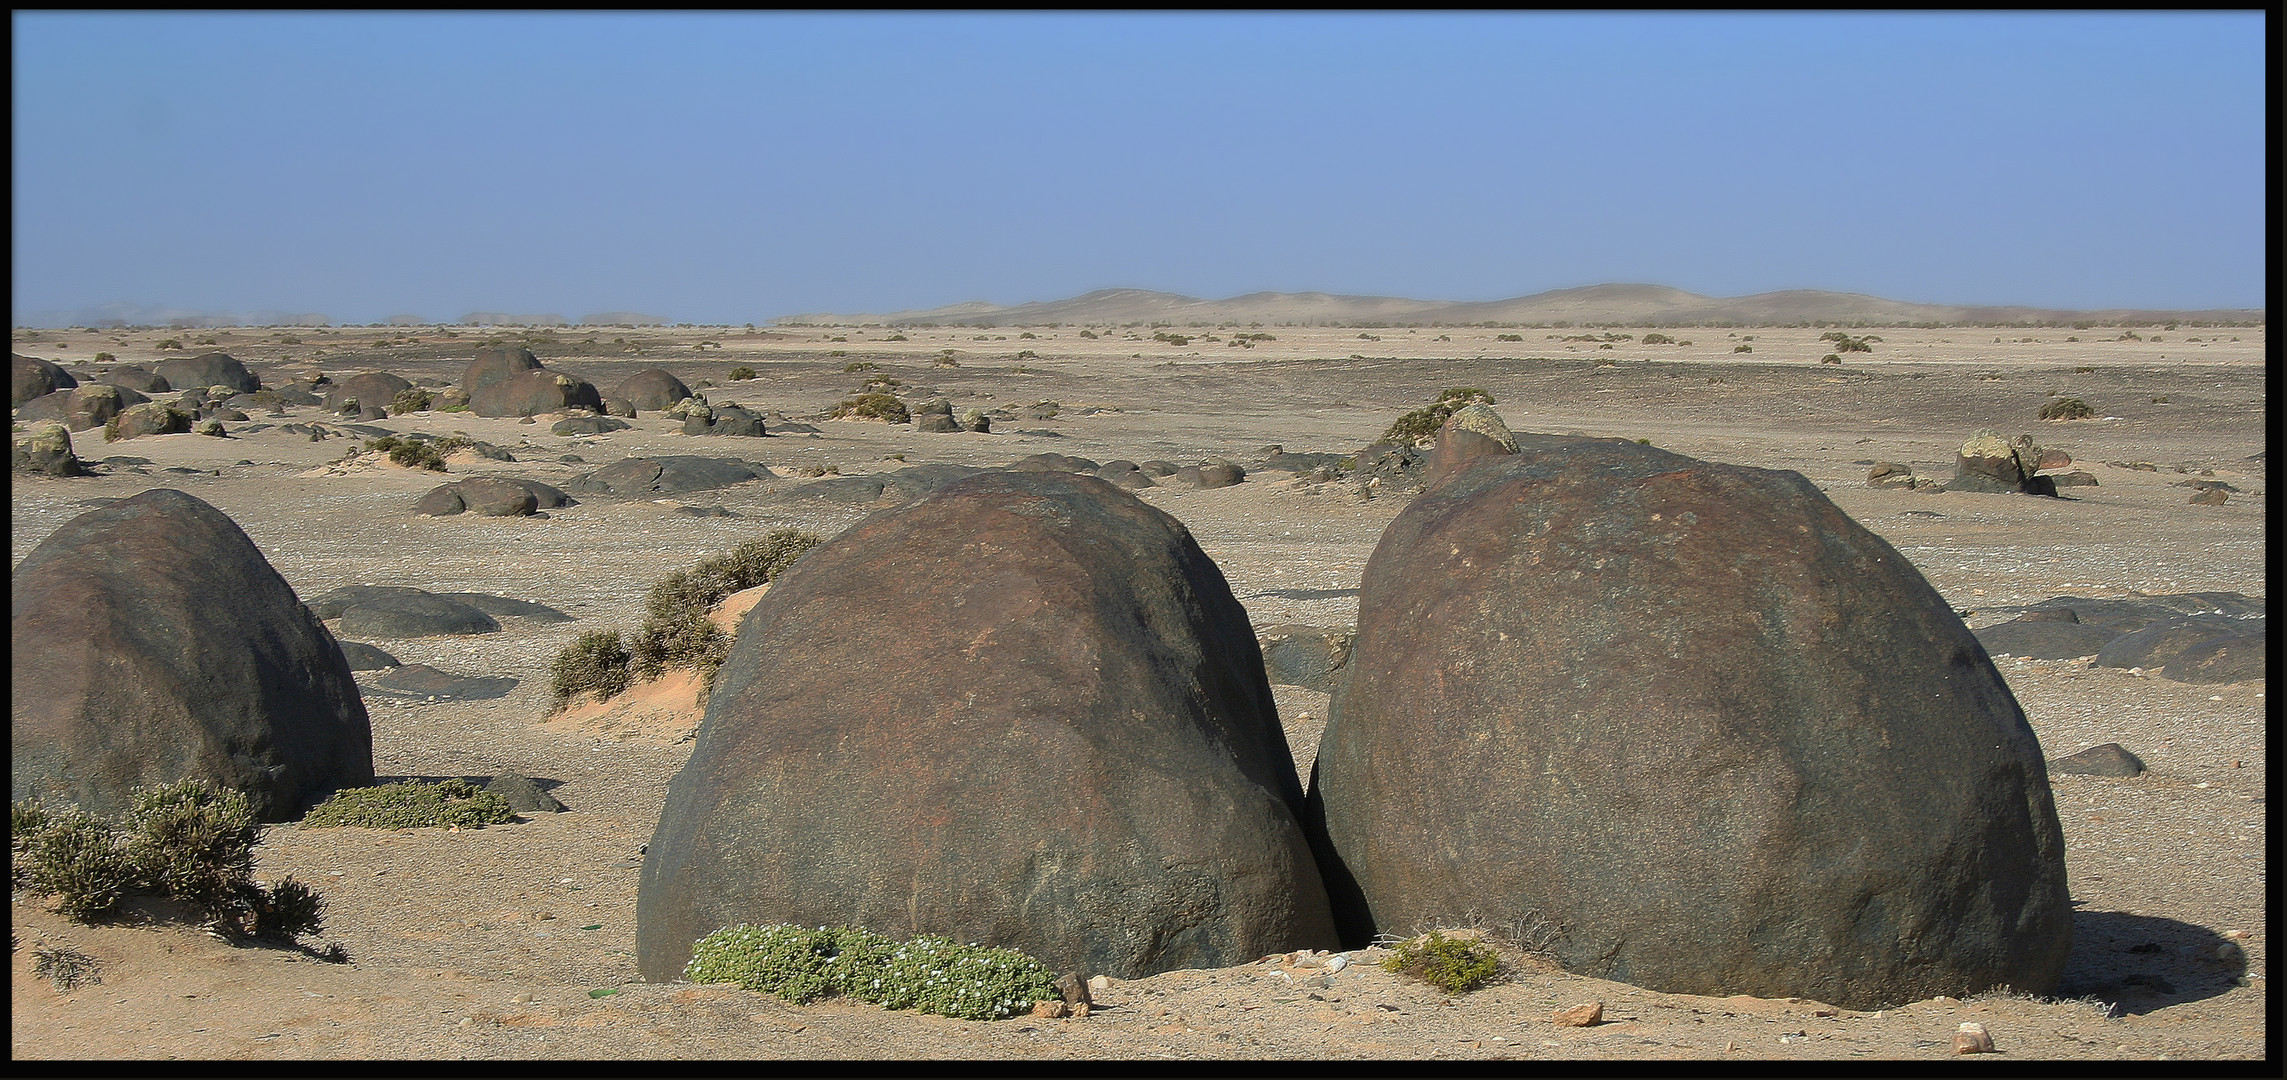 Die Wüste lebt.